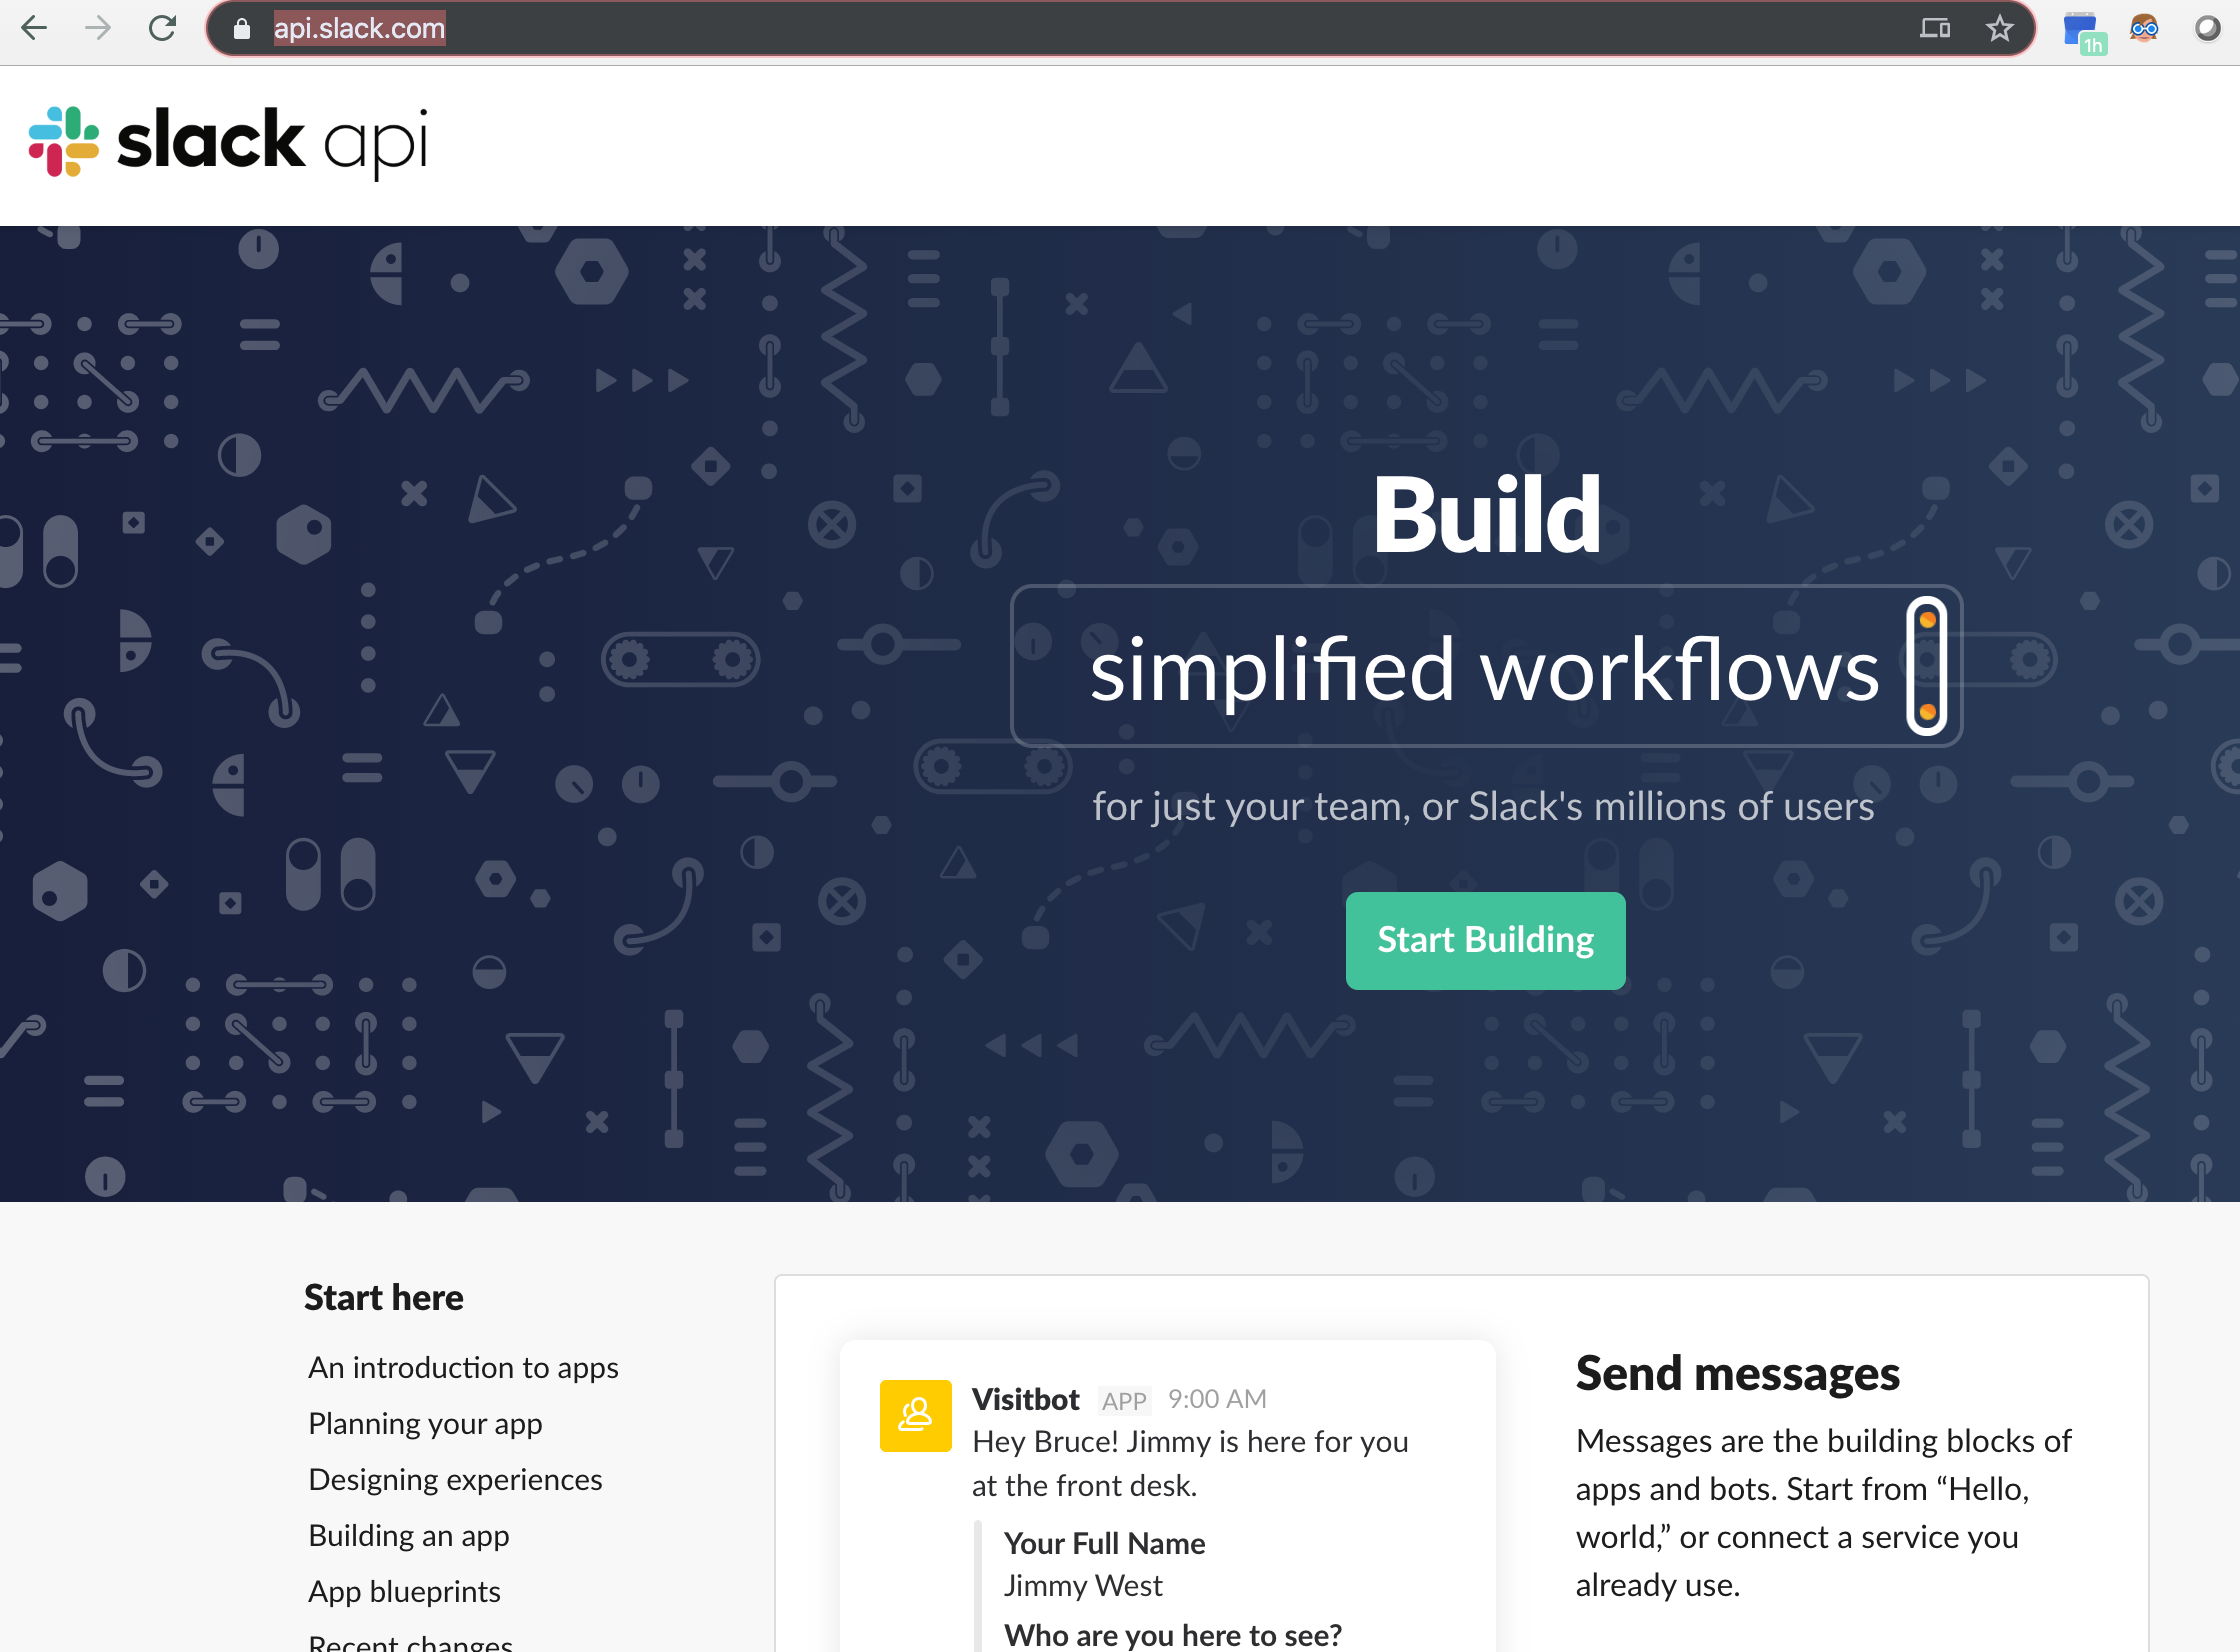 Slack_API01.png